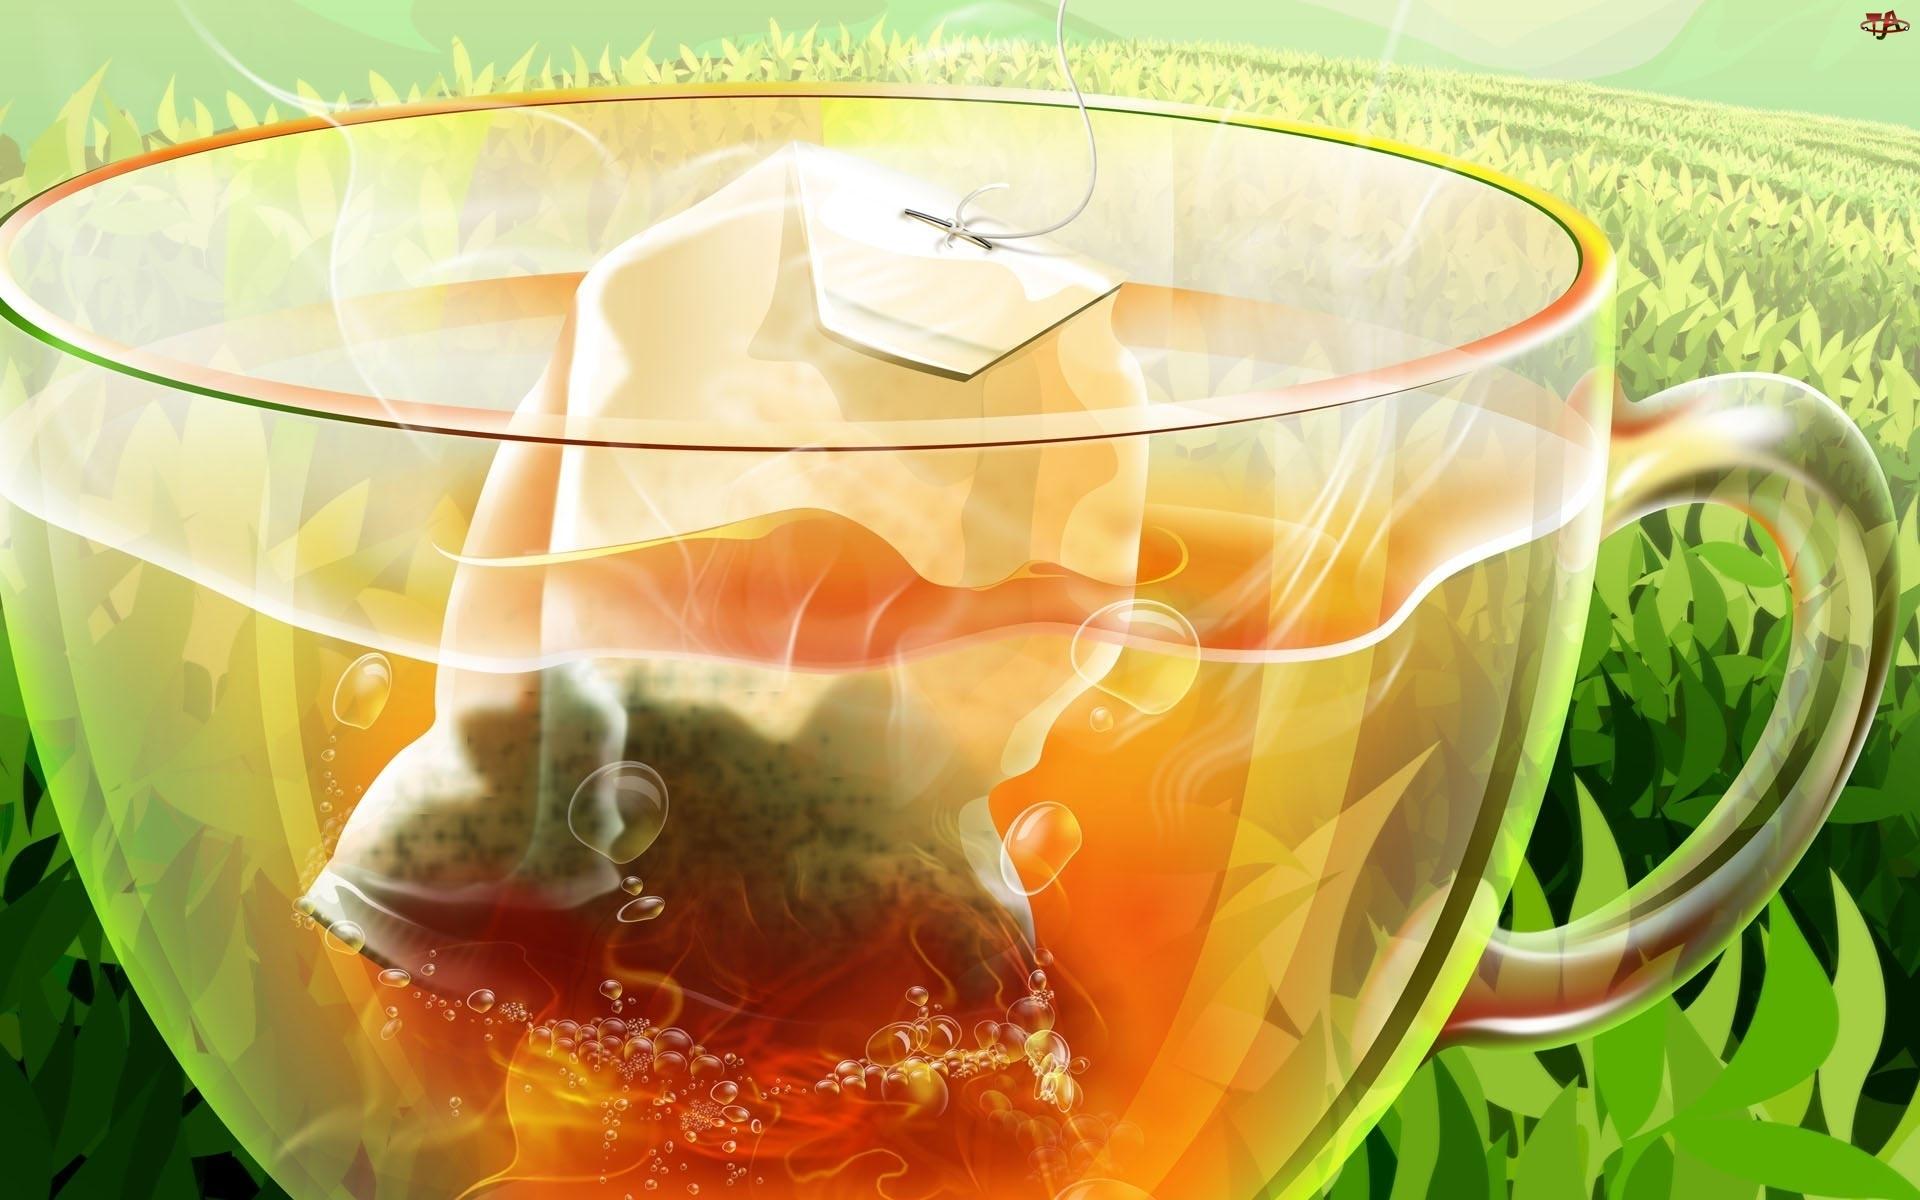 Grafika, Filiżanka, Herbaty